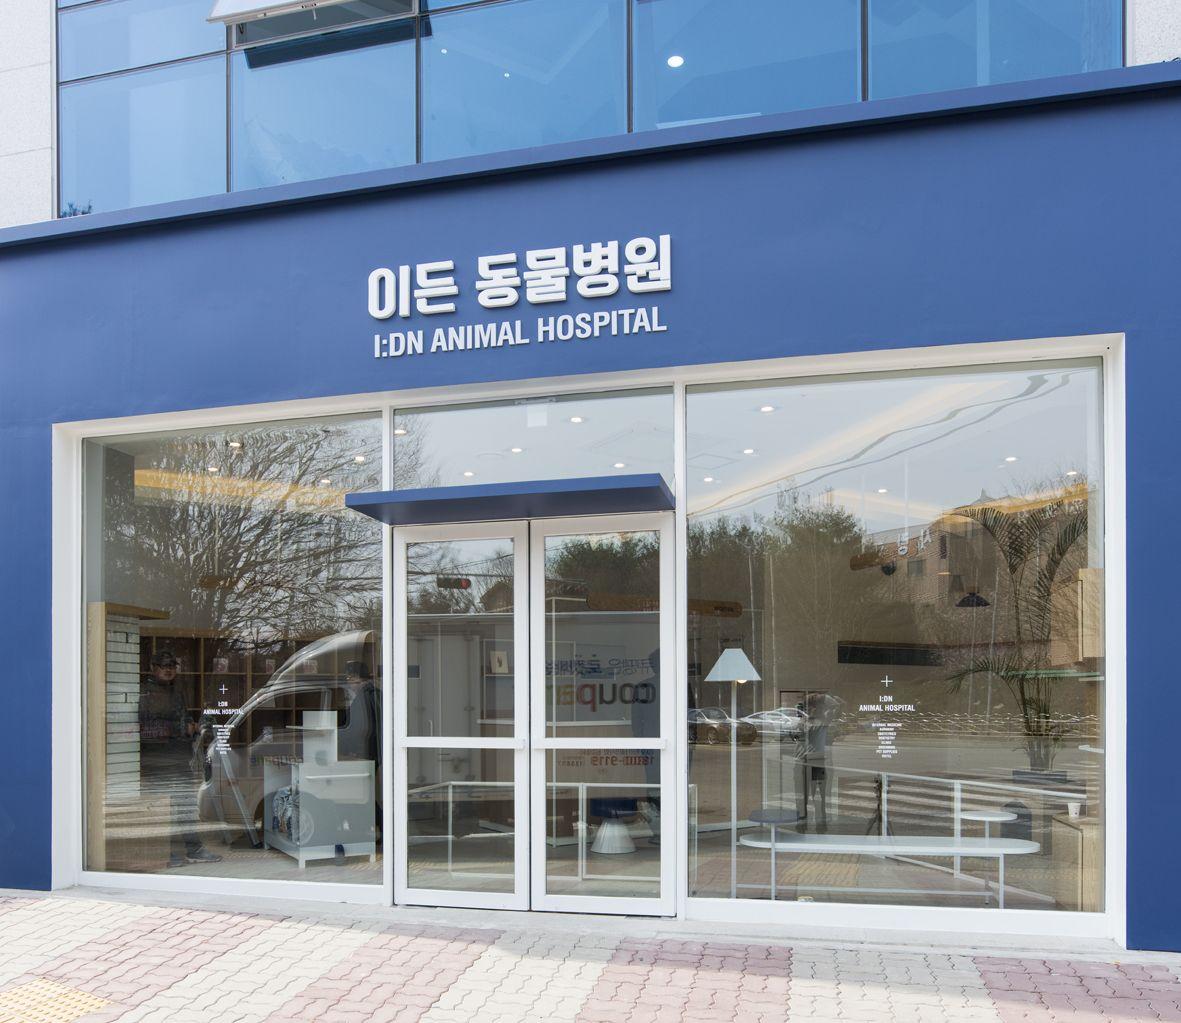 IDN ANIMAL HOSPITAL 이든 동물병원 SPACE LITA(이미지 포함) 건축